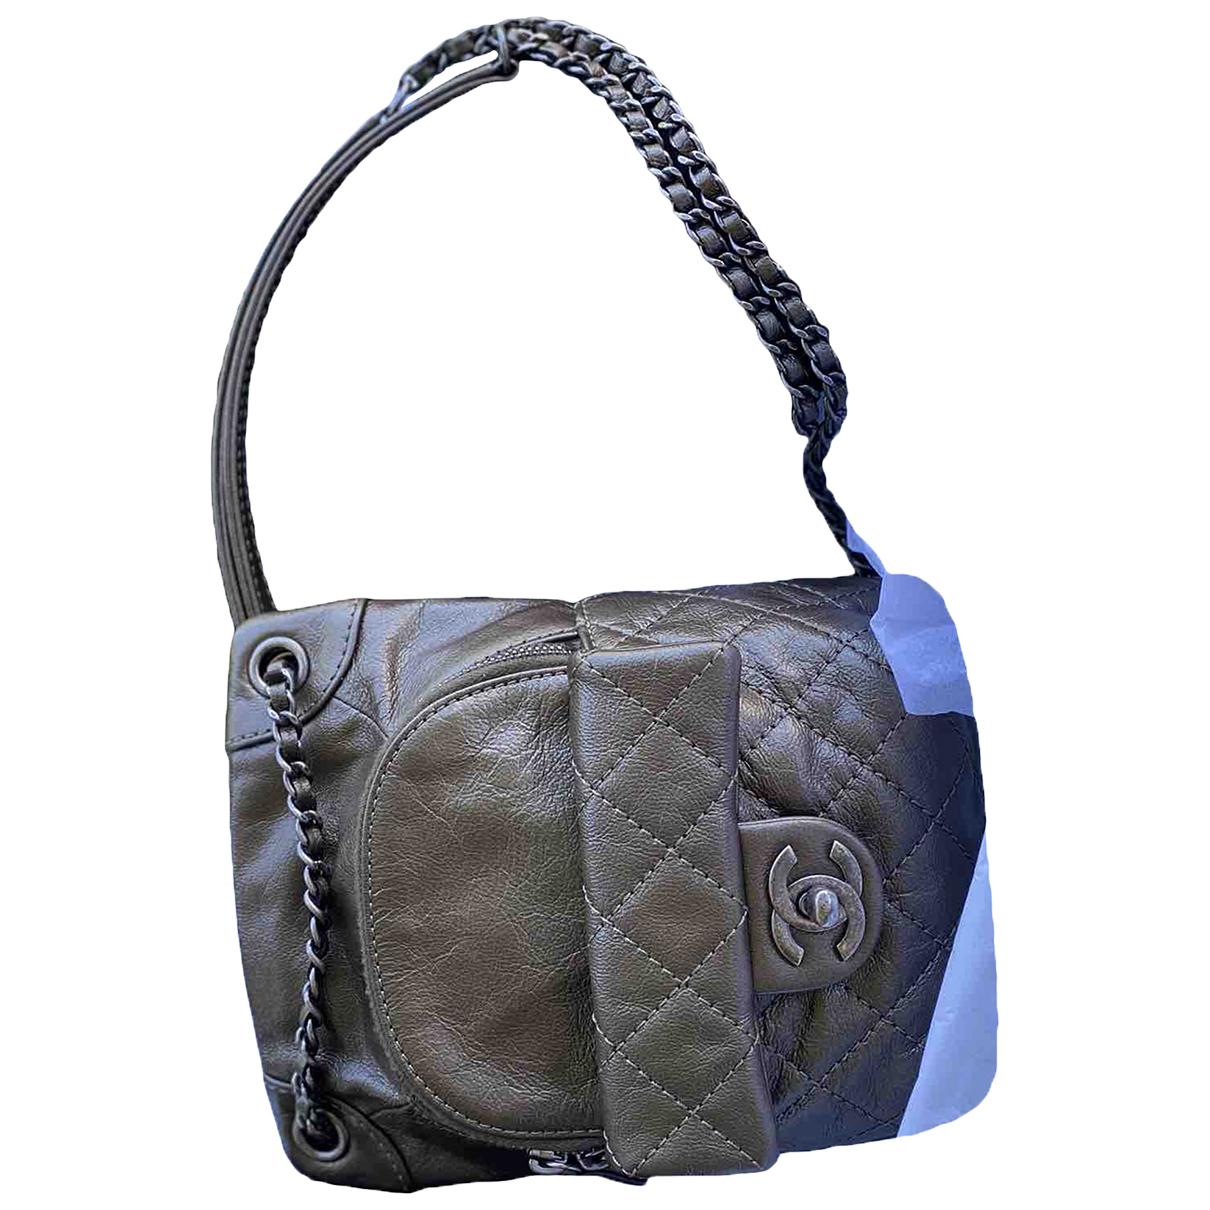 Chanel - Sac a dos   pour femme en cuir - kaki